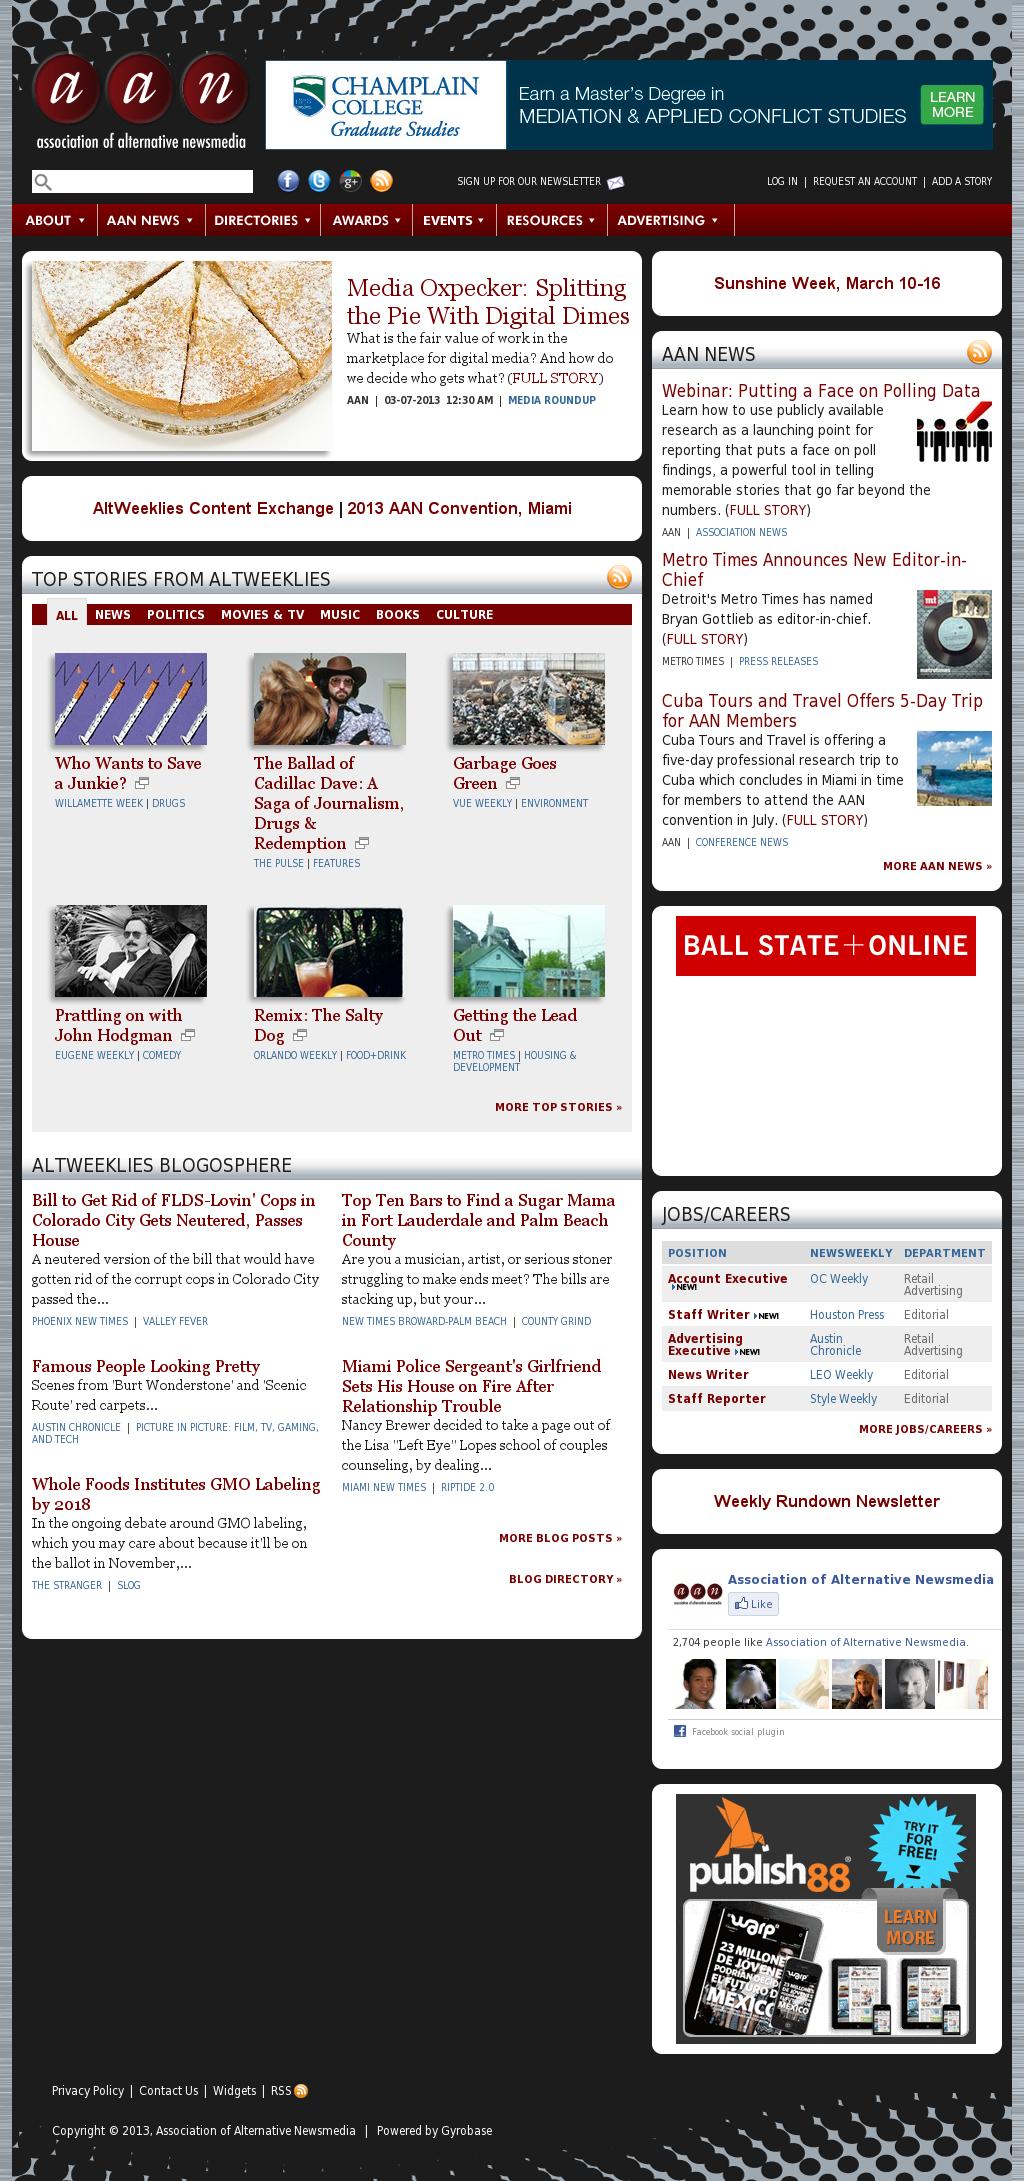 Association of Alternative Newsmedia at Monday March 11, 2013, 8 a.m. UTC